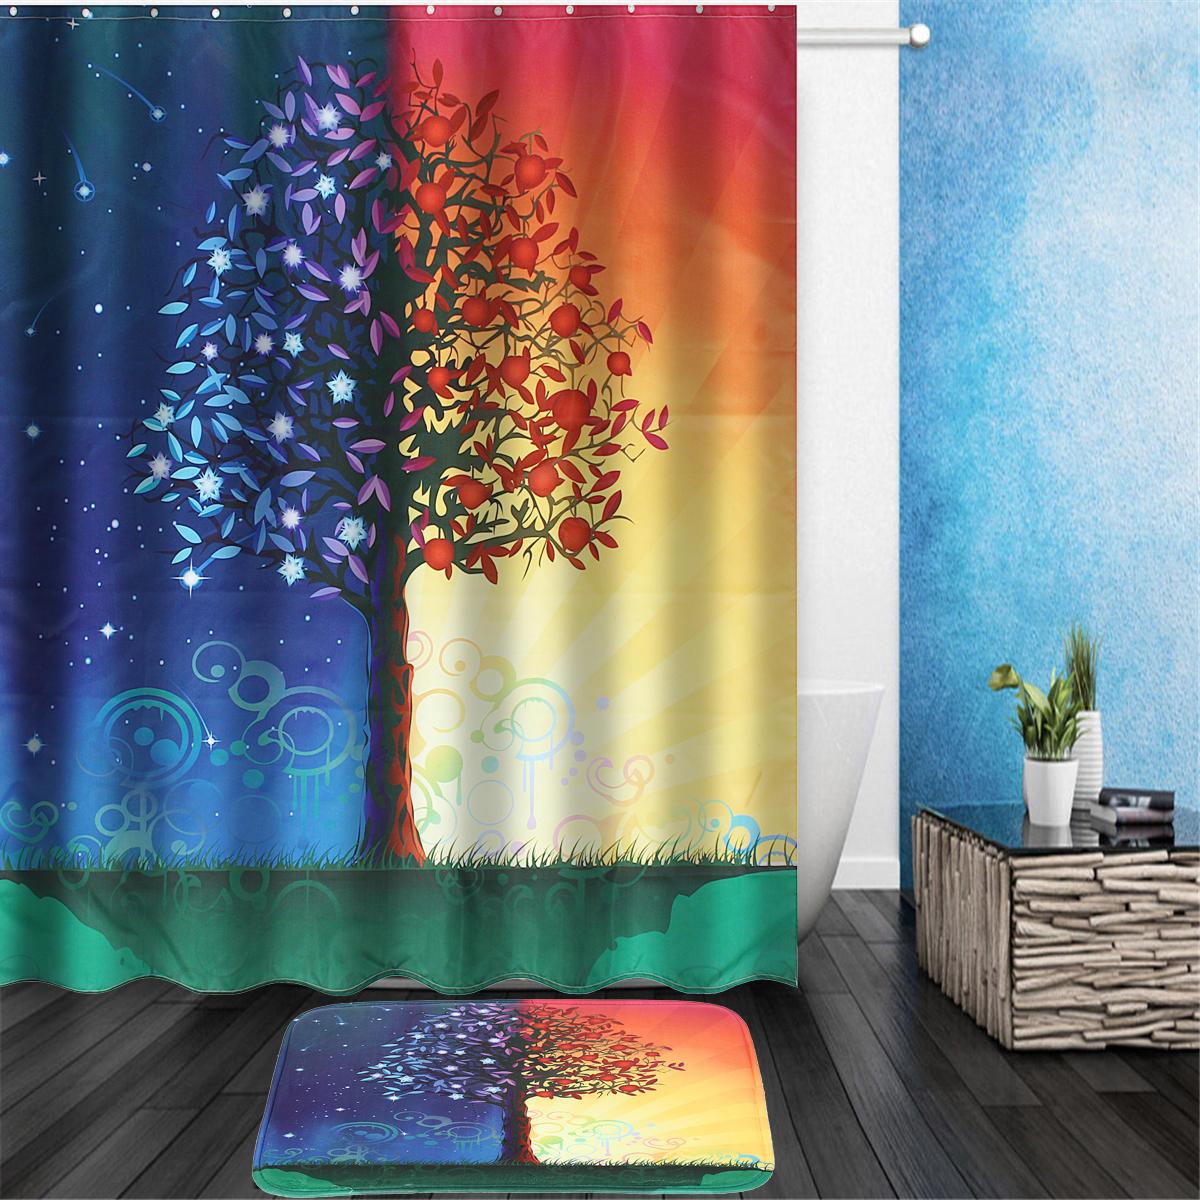 Day & Night Tree Shower Curtain Liner Bathroom Mat Set w/ Hooks Polyester Fabric